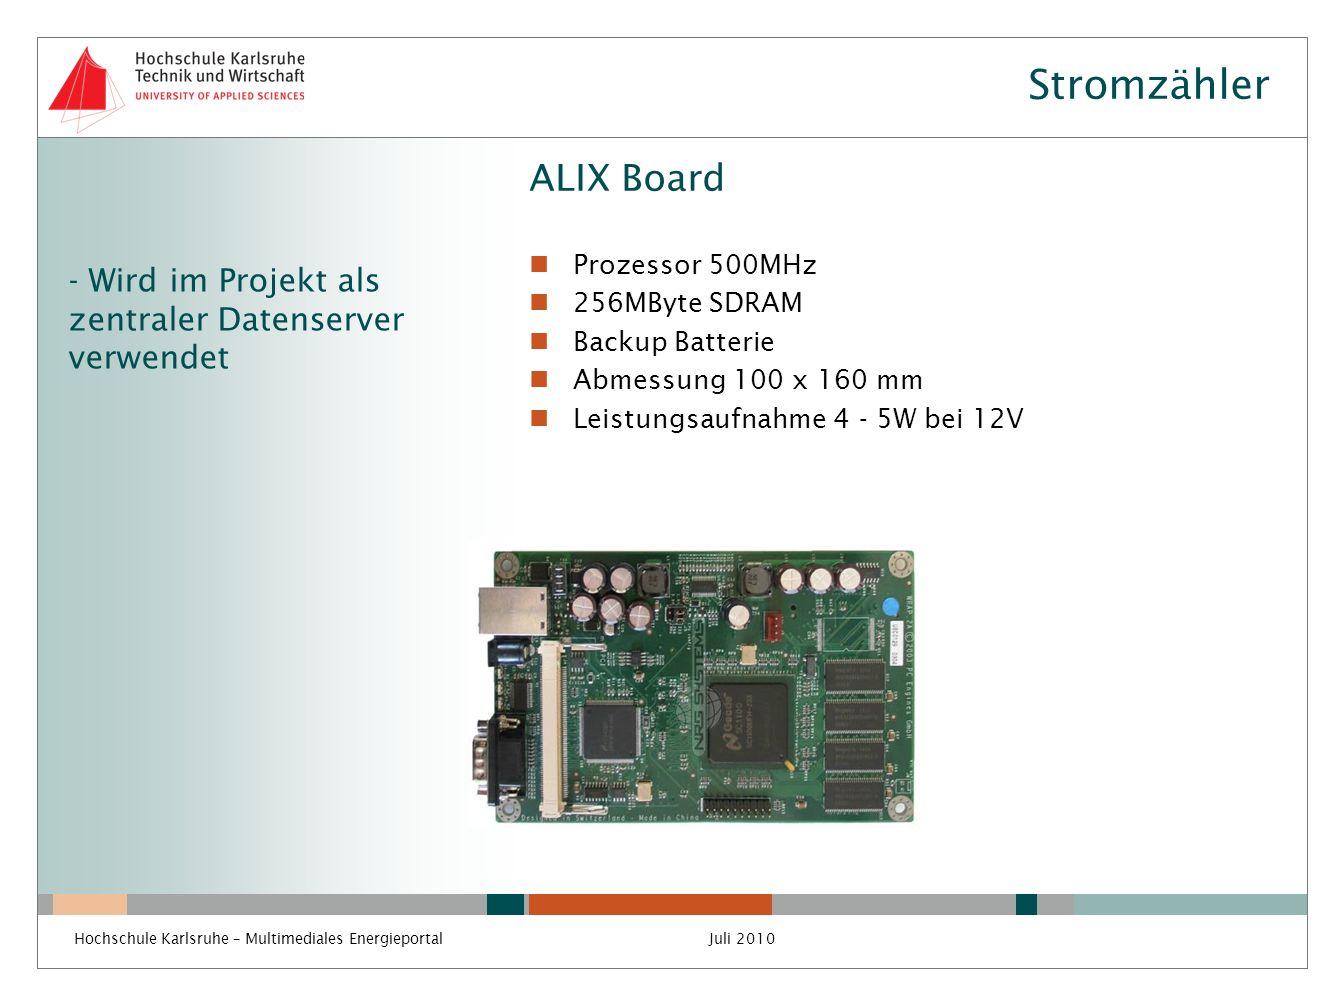 Stromzähler ALIX Board